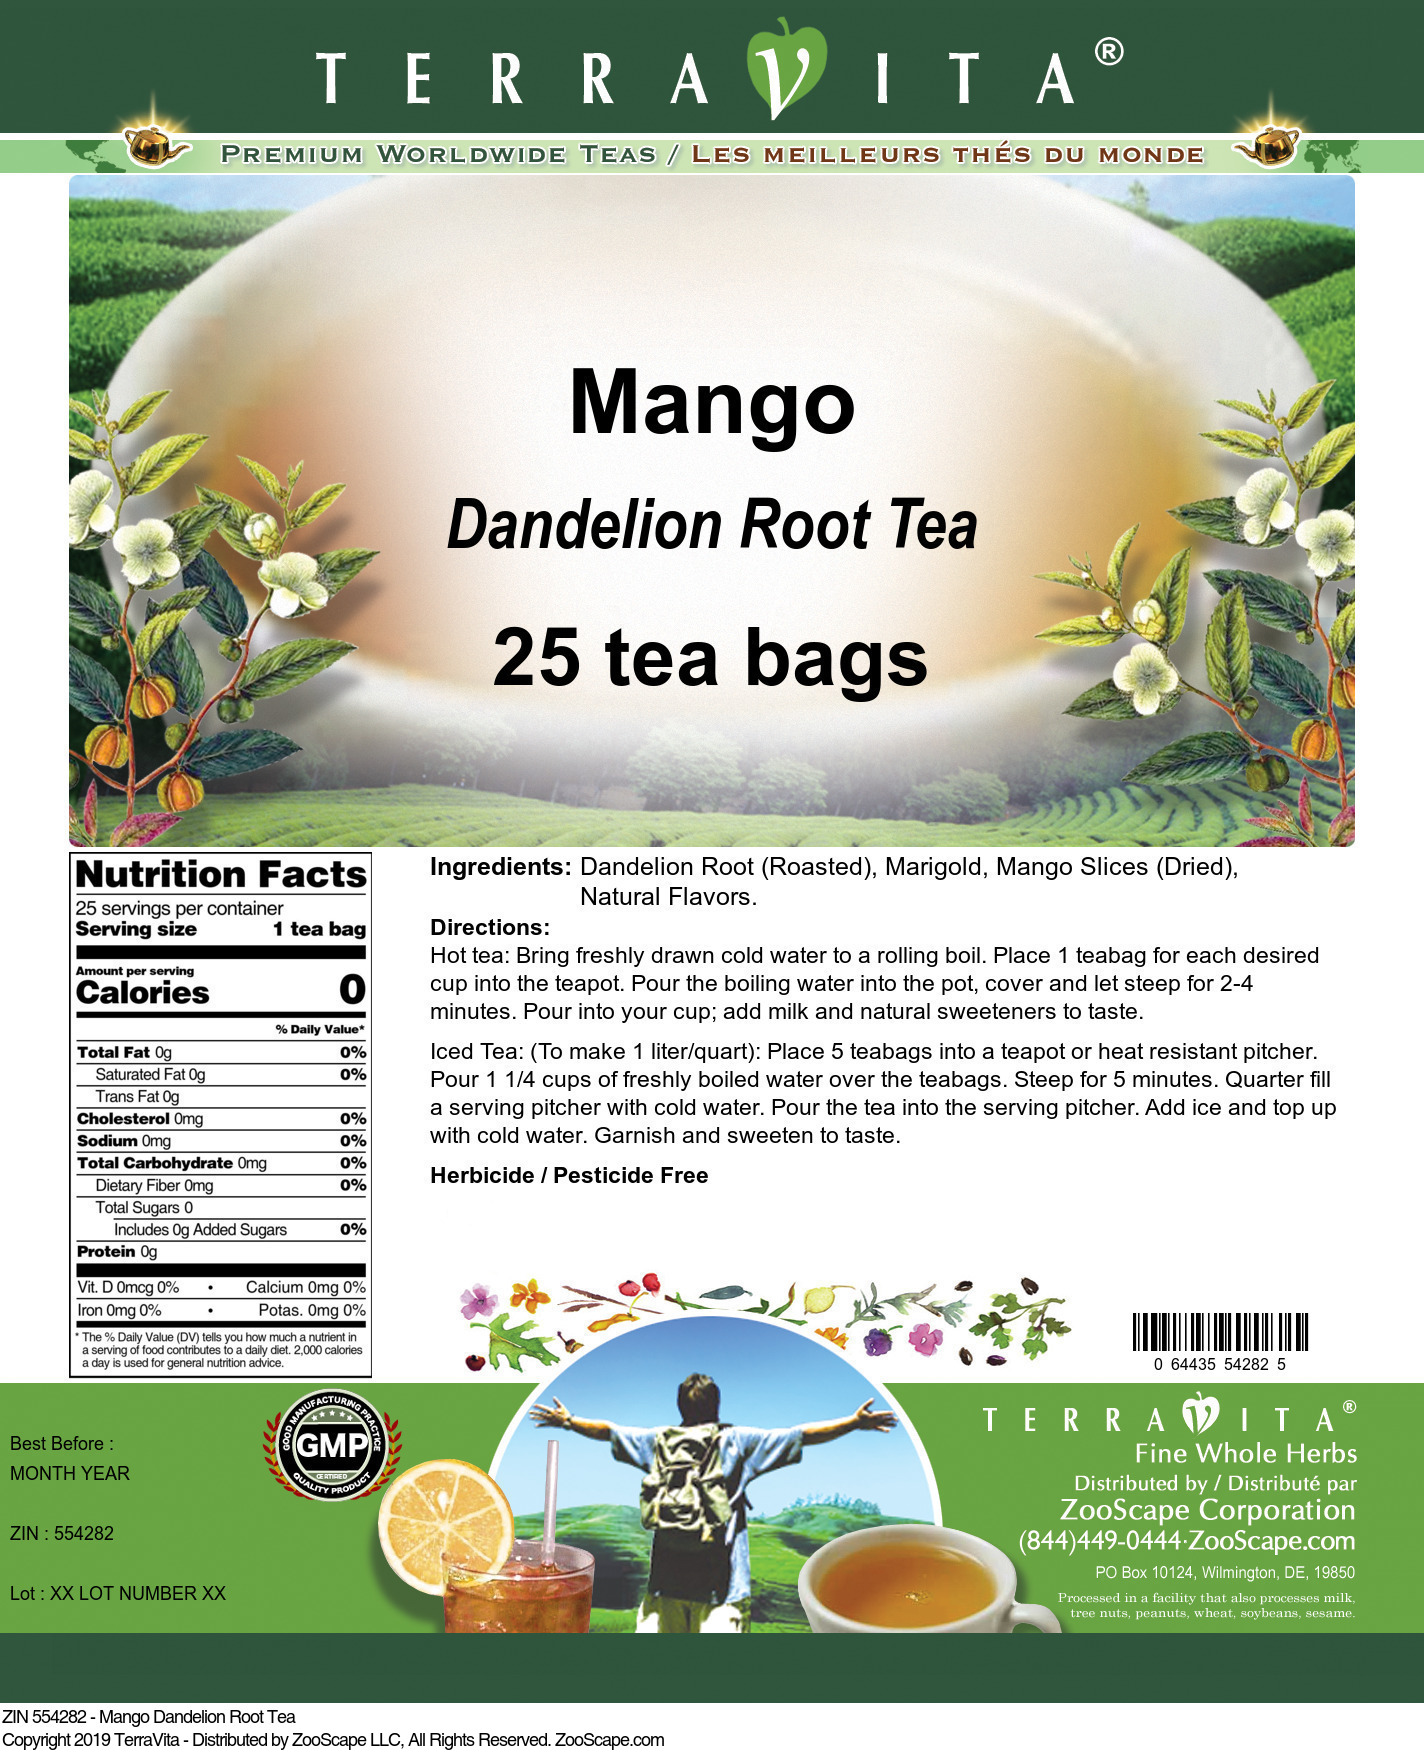 Mango Dandelion Root